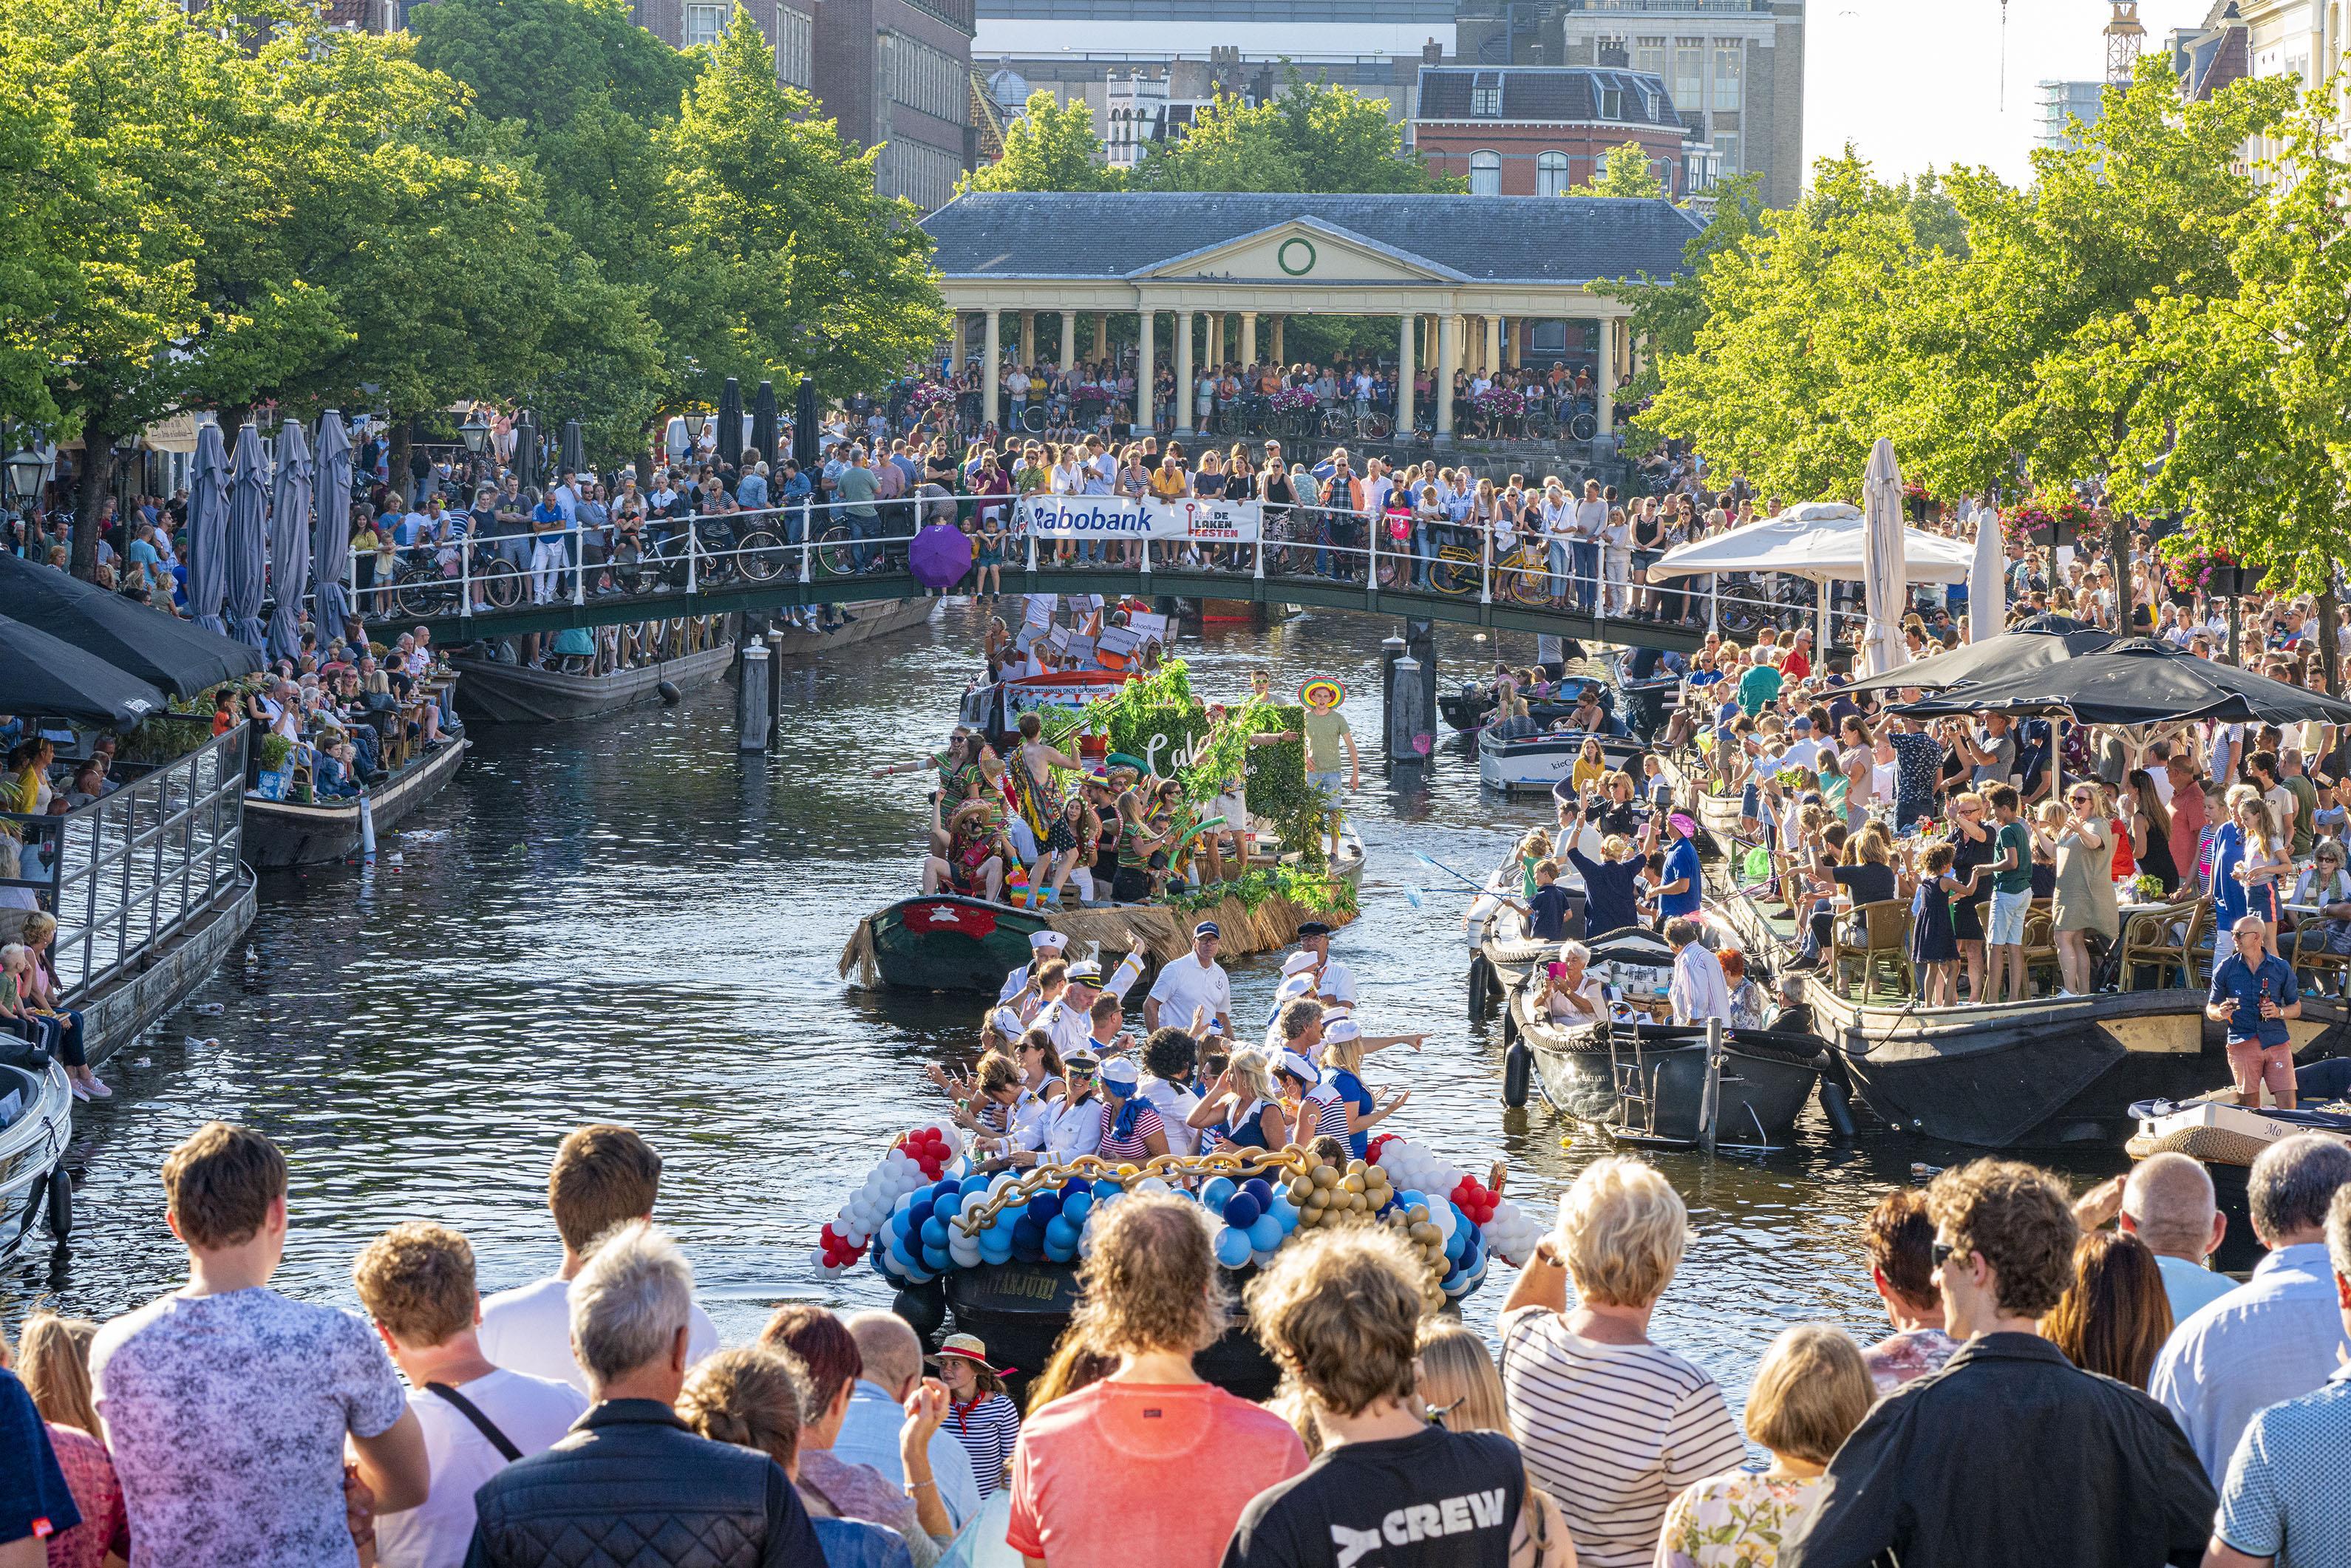 Leiden stelt zich in op invasie van toeristen